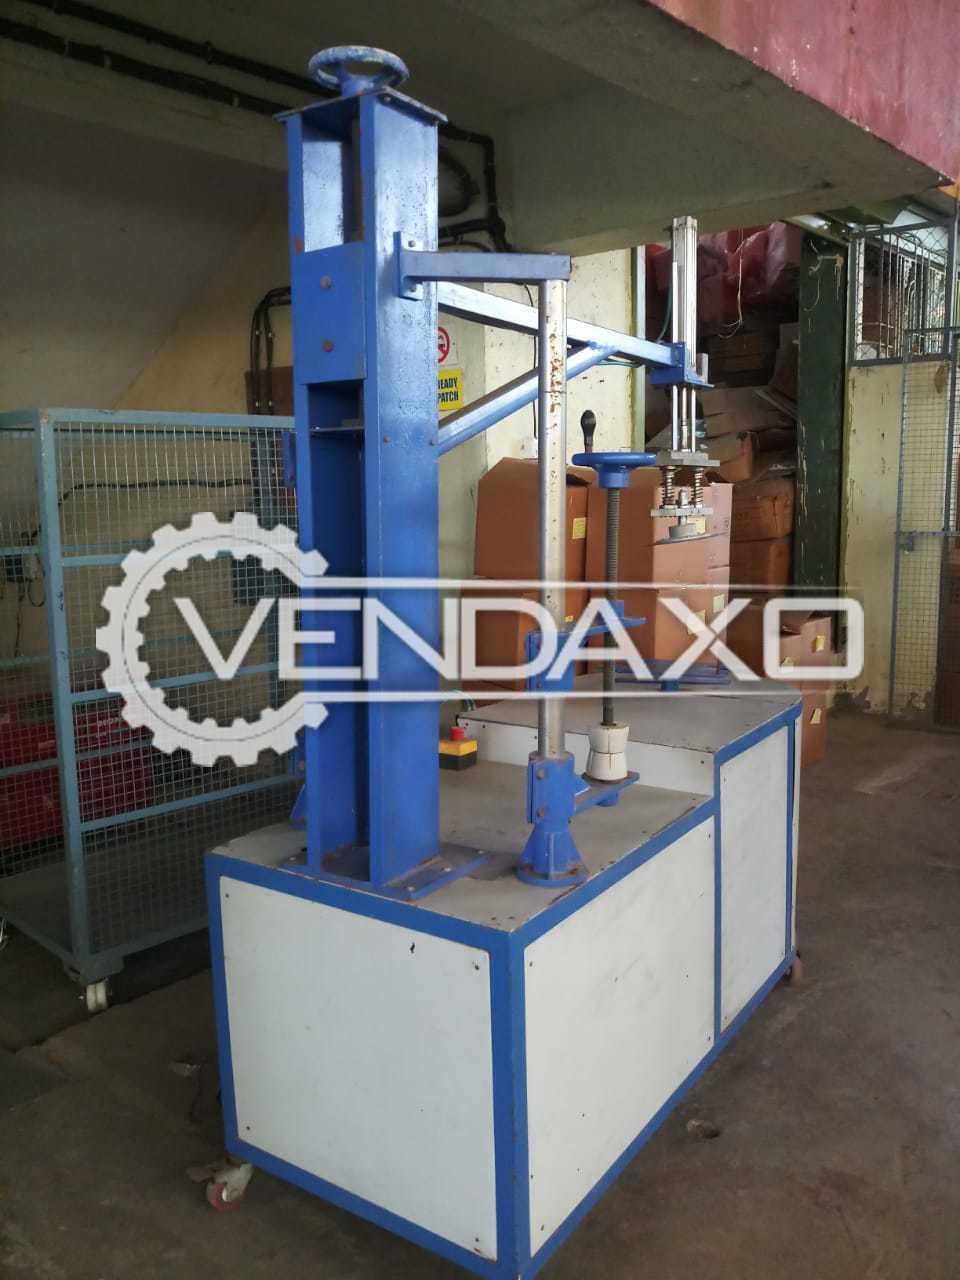 Box Warping Machine - 4.5 x 3 Feet